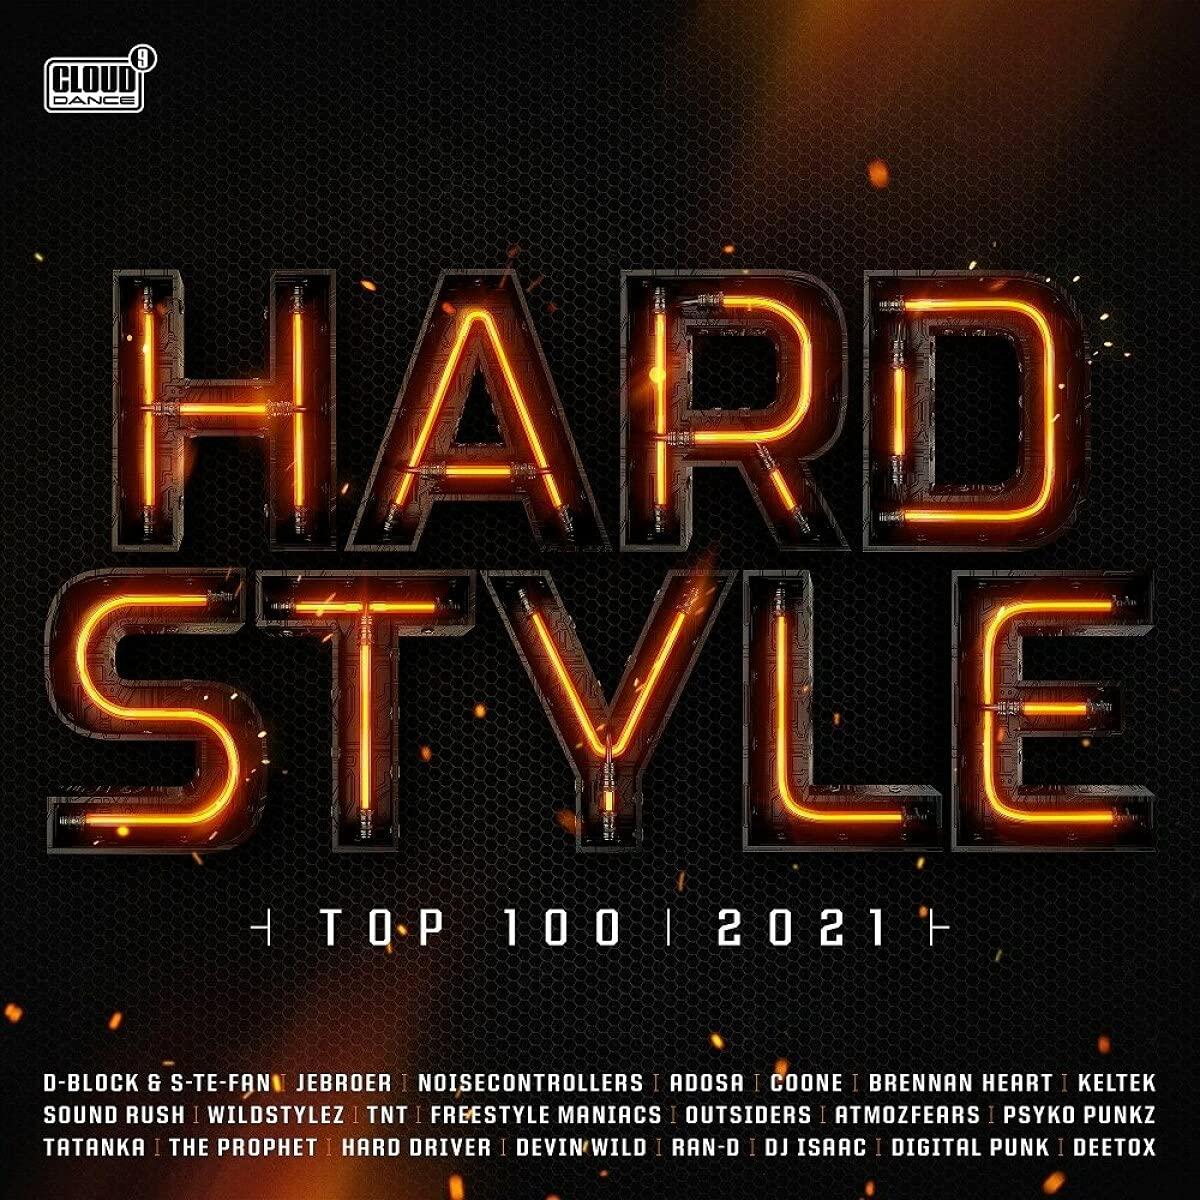 VA – Hardstyle Top 100 2021 (2021) [FLAC]